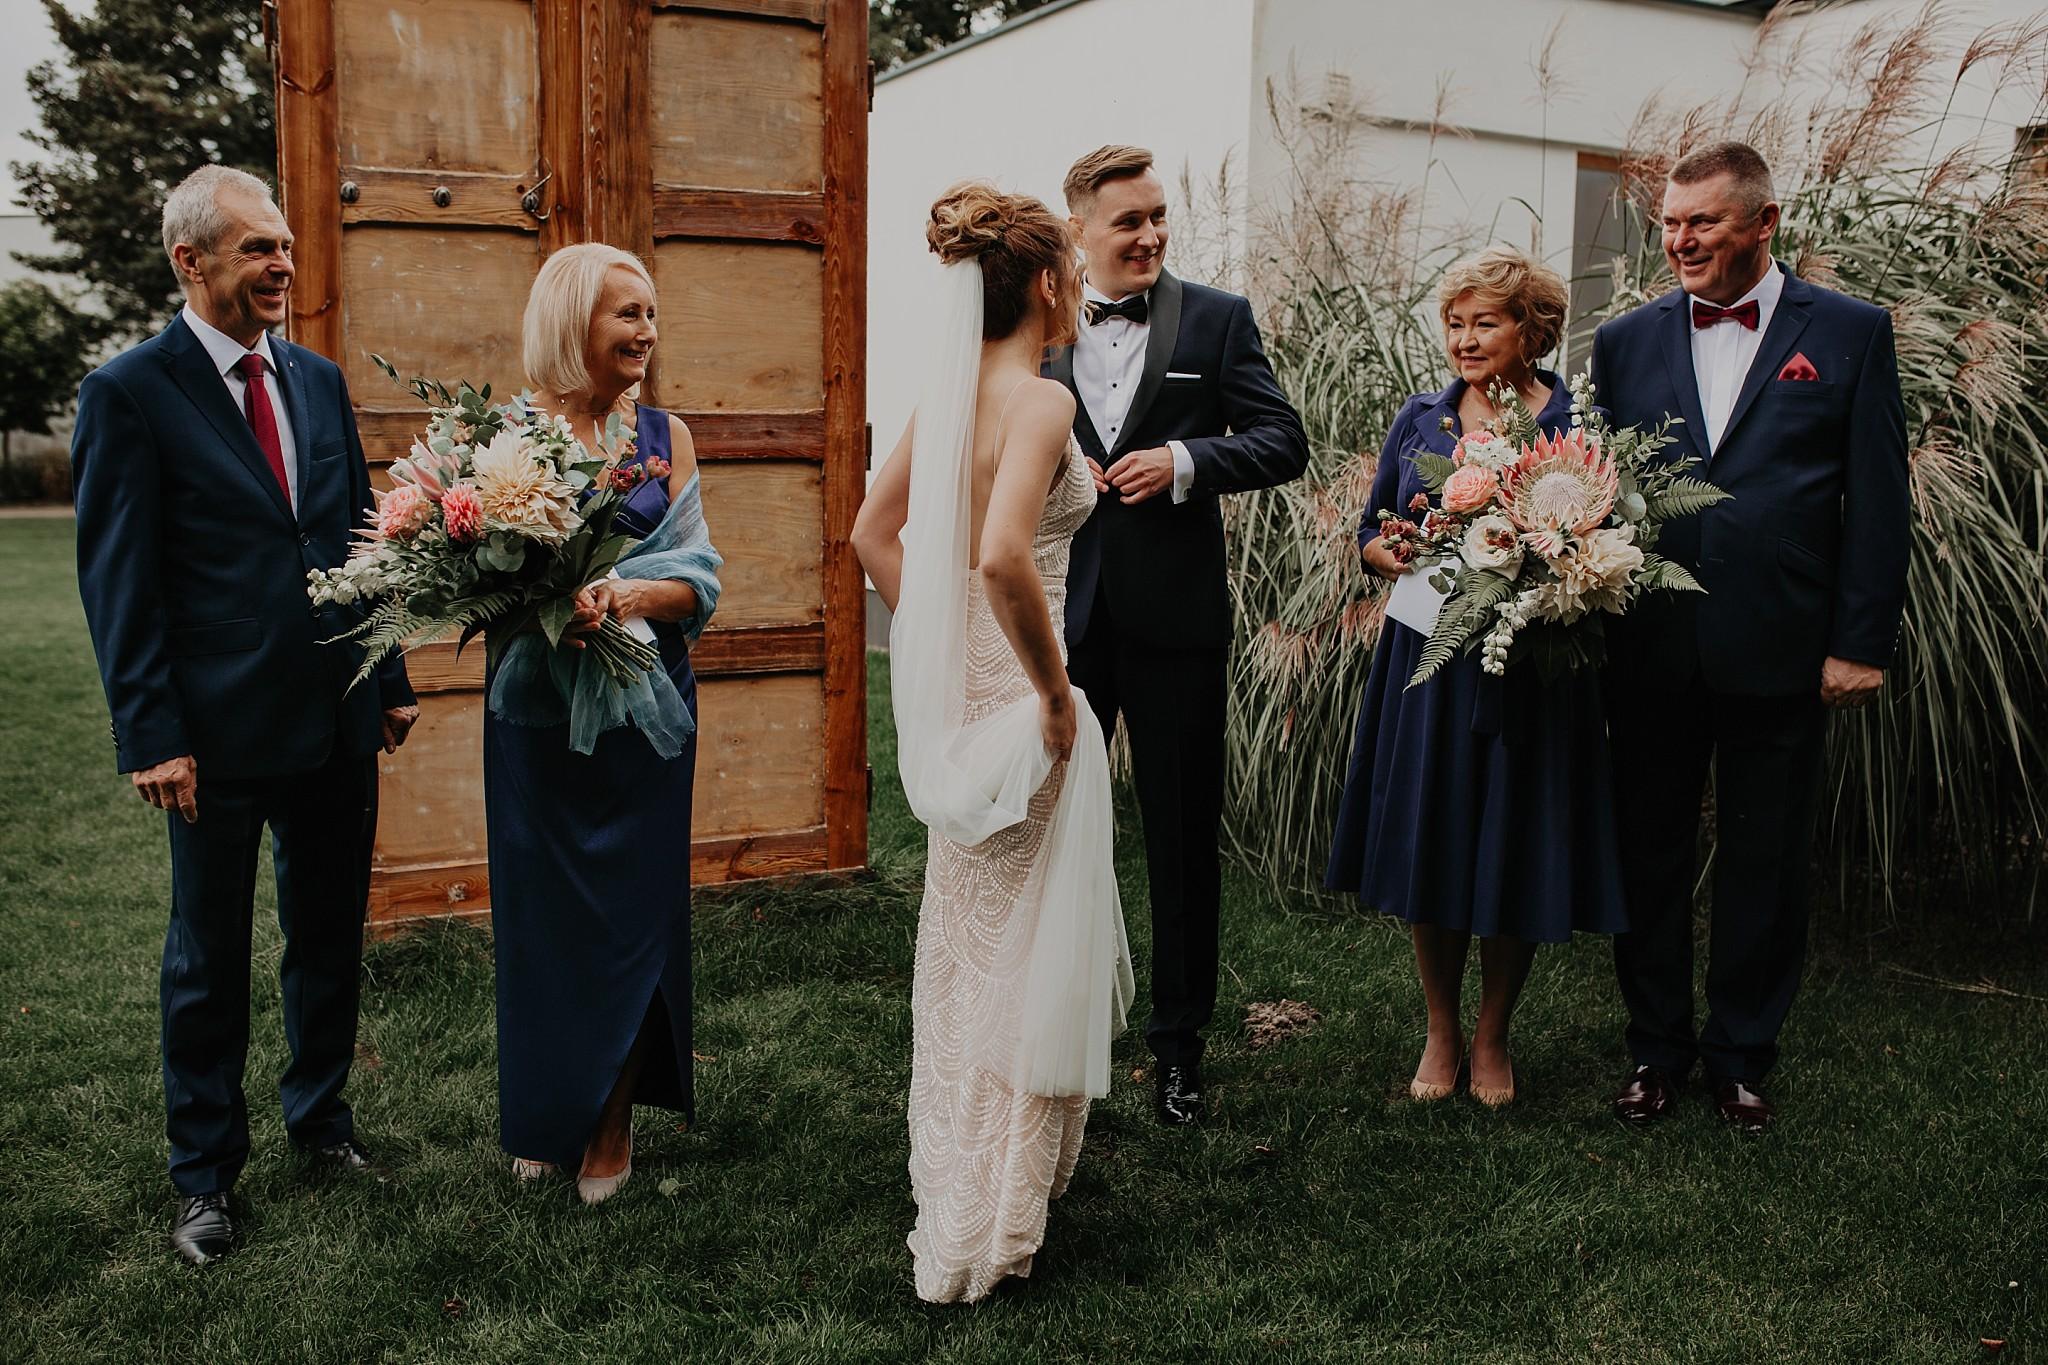 fotograf poznan wesele dobra truskawka piekne wesele pod poznaniem wesele w dobrej truskawce piekna para mloda slub marzen slub koronawirus slub listopad wesele koronawirus 107